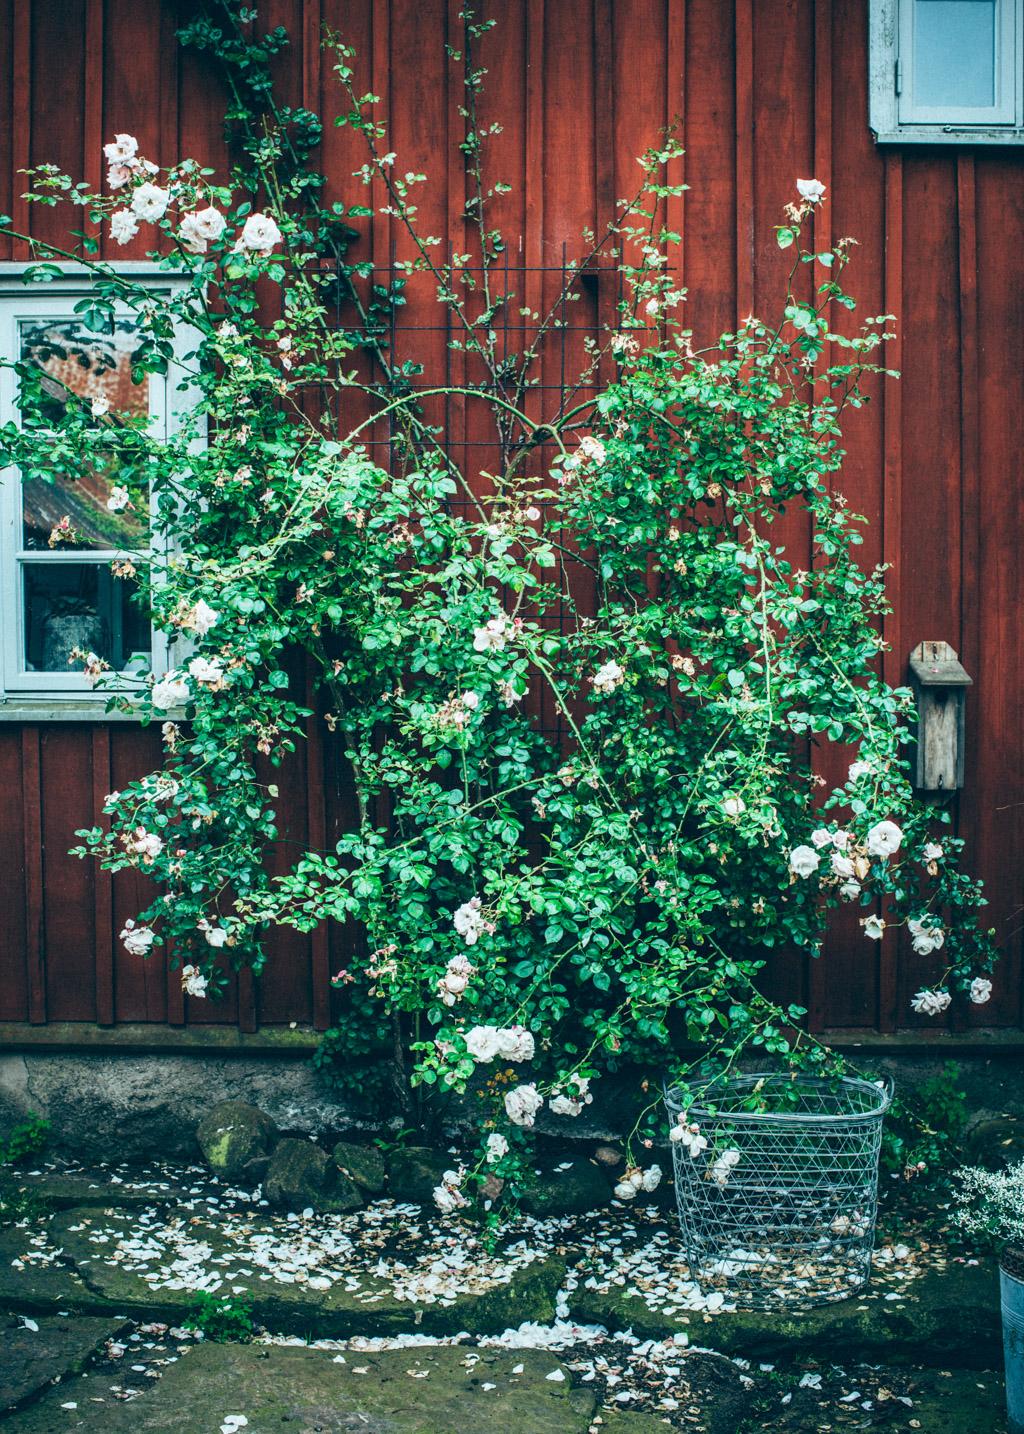 hakesgard2_web_kristin lagerqvist-8943